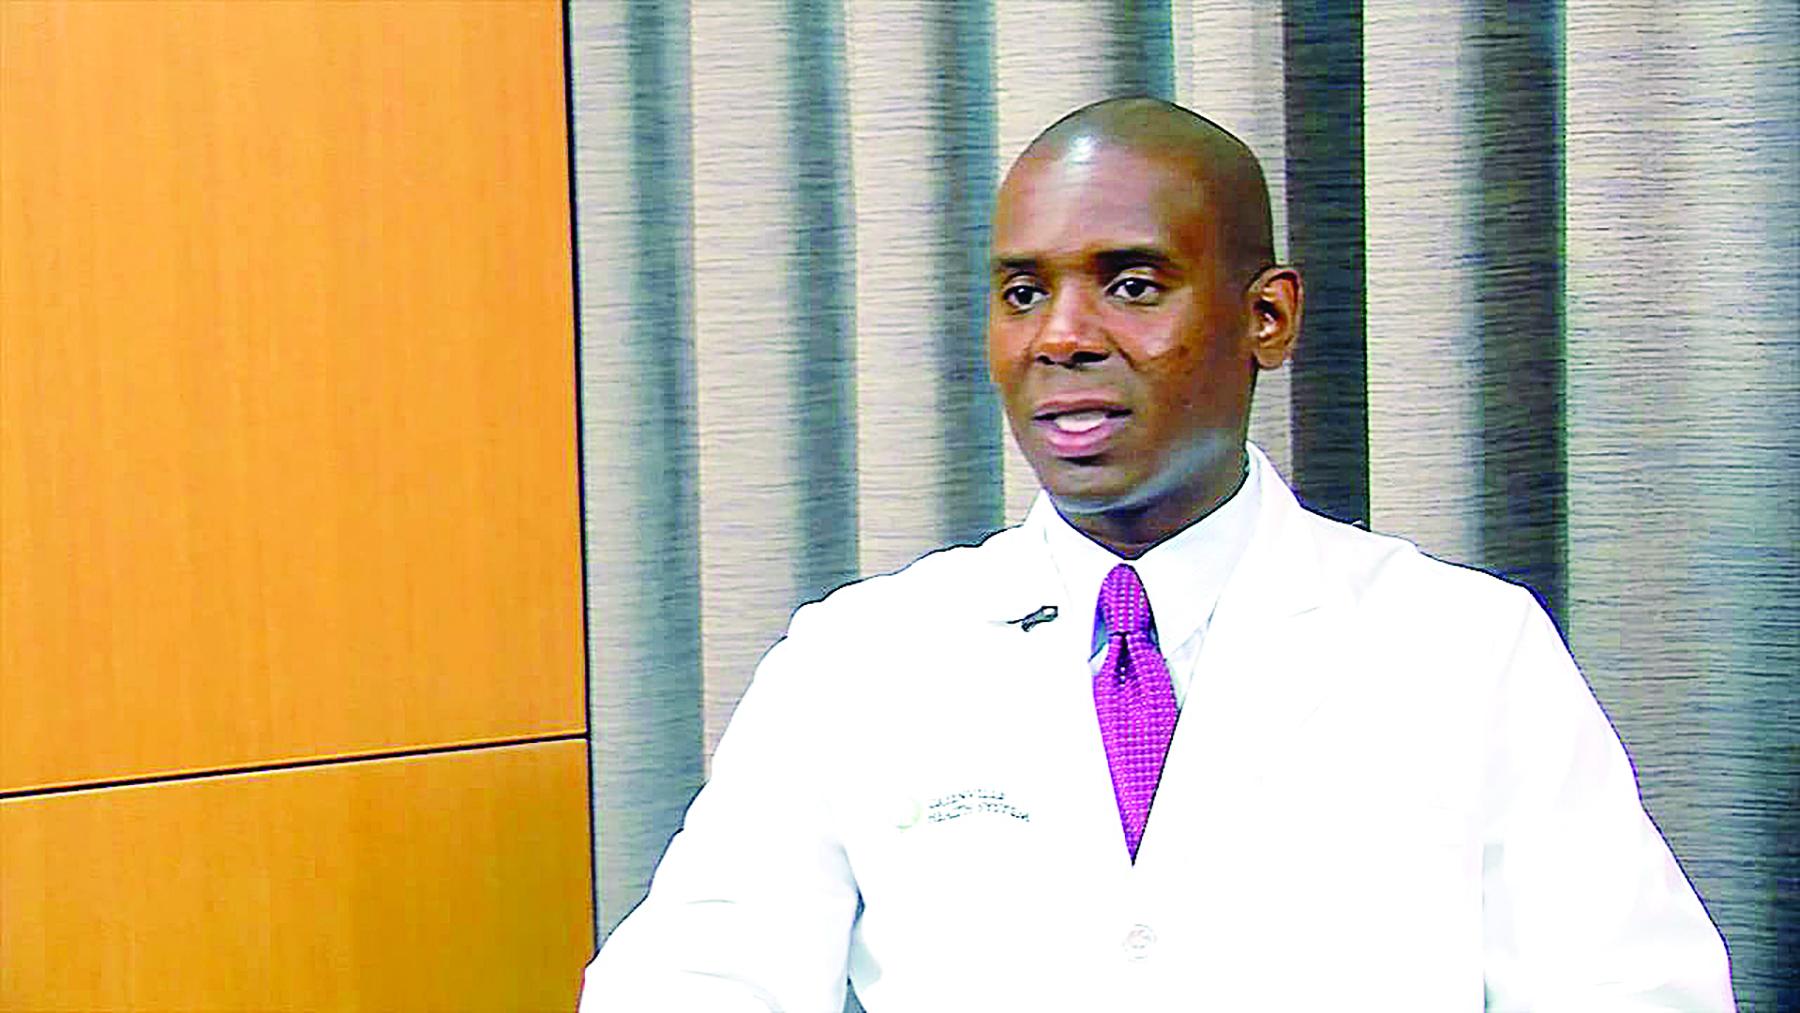 Photo of Blacks Need Vital Colon Cancer Screening